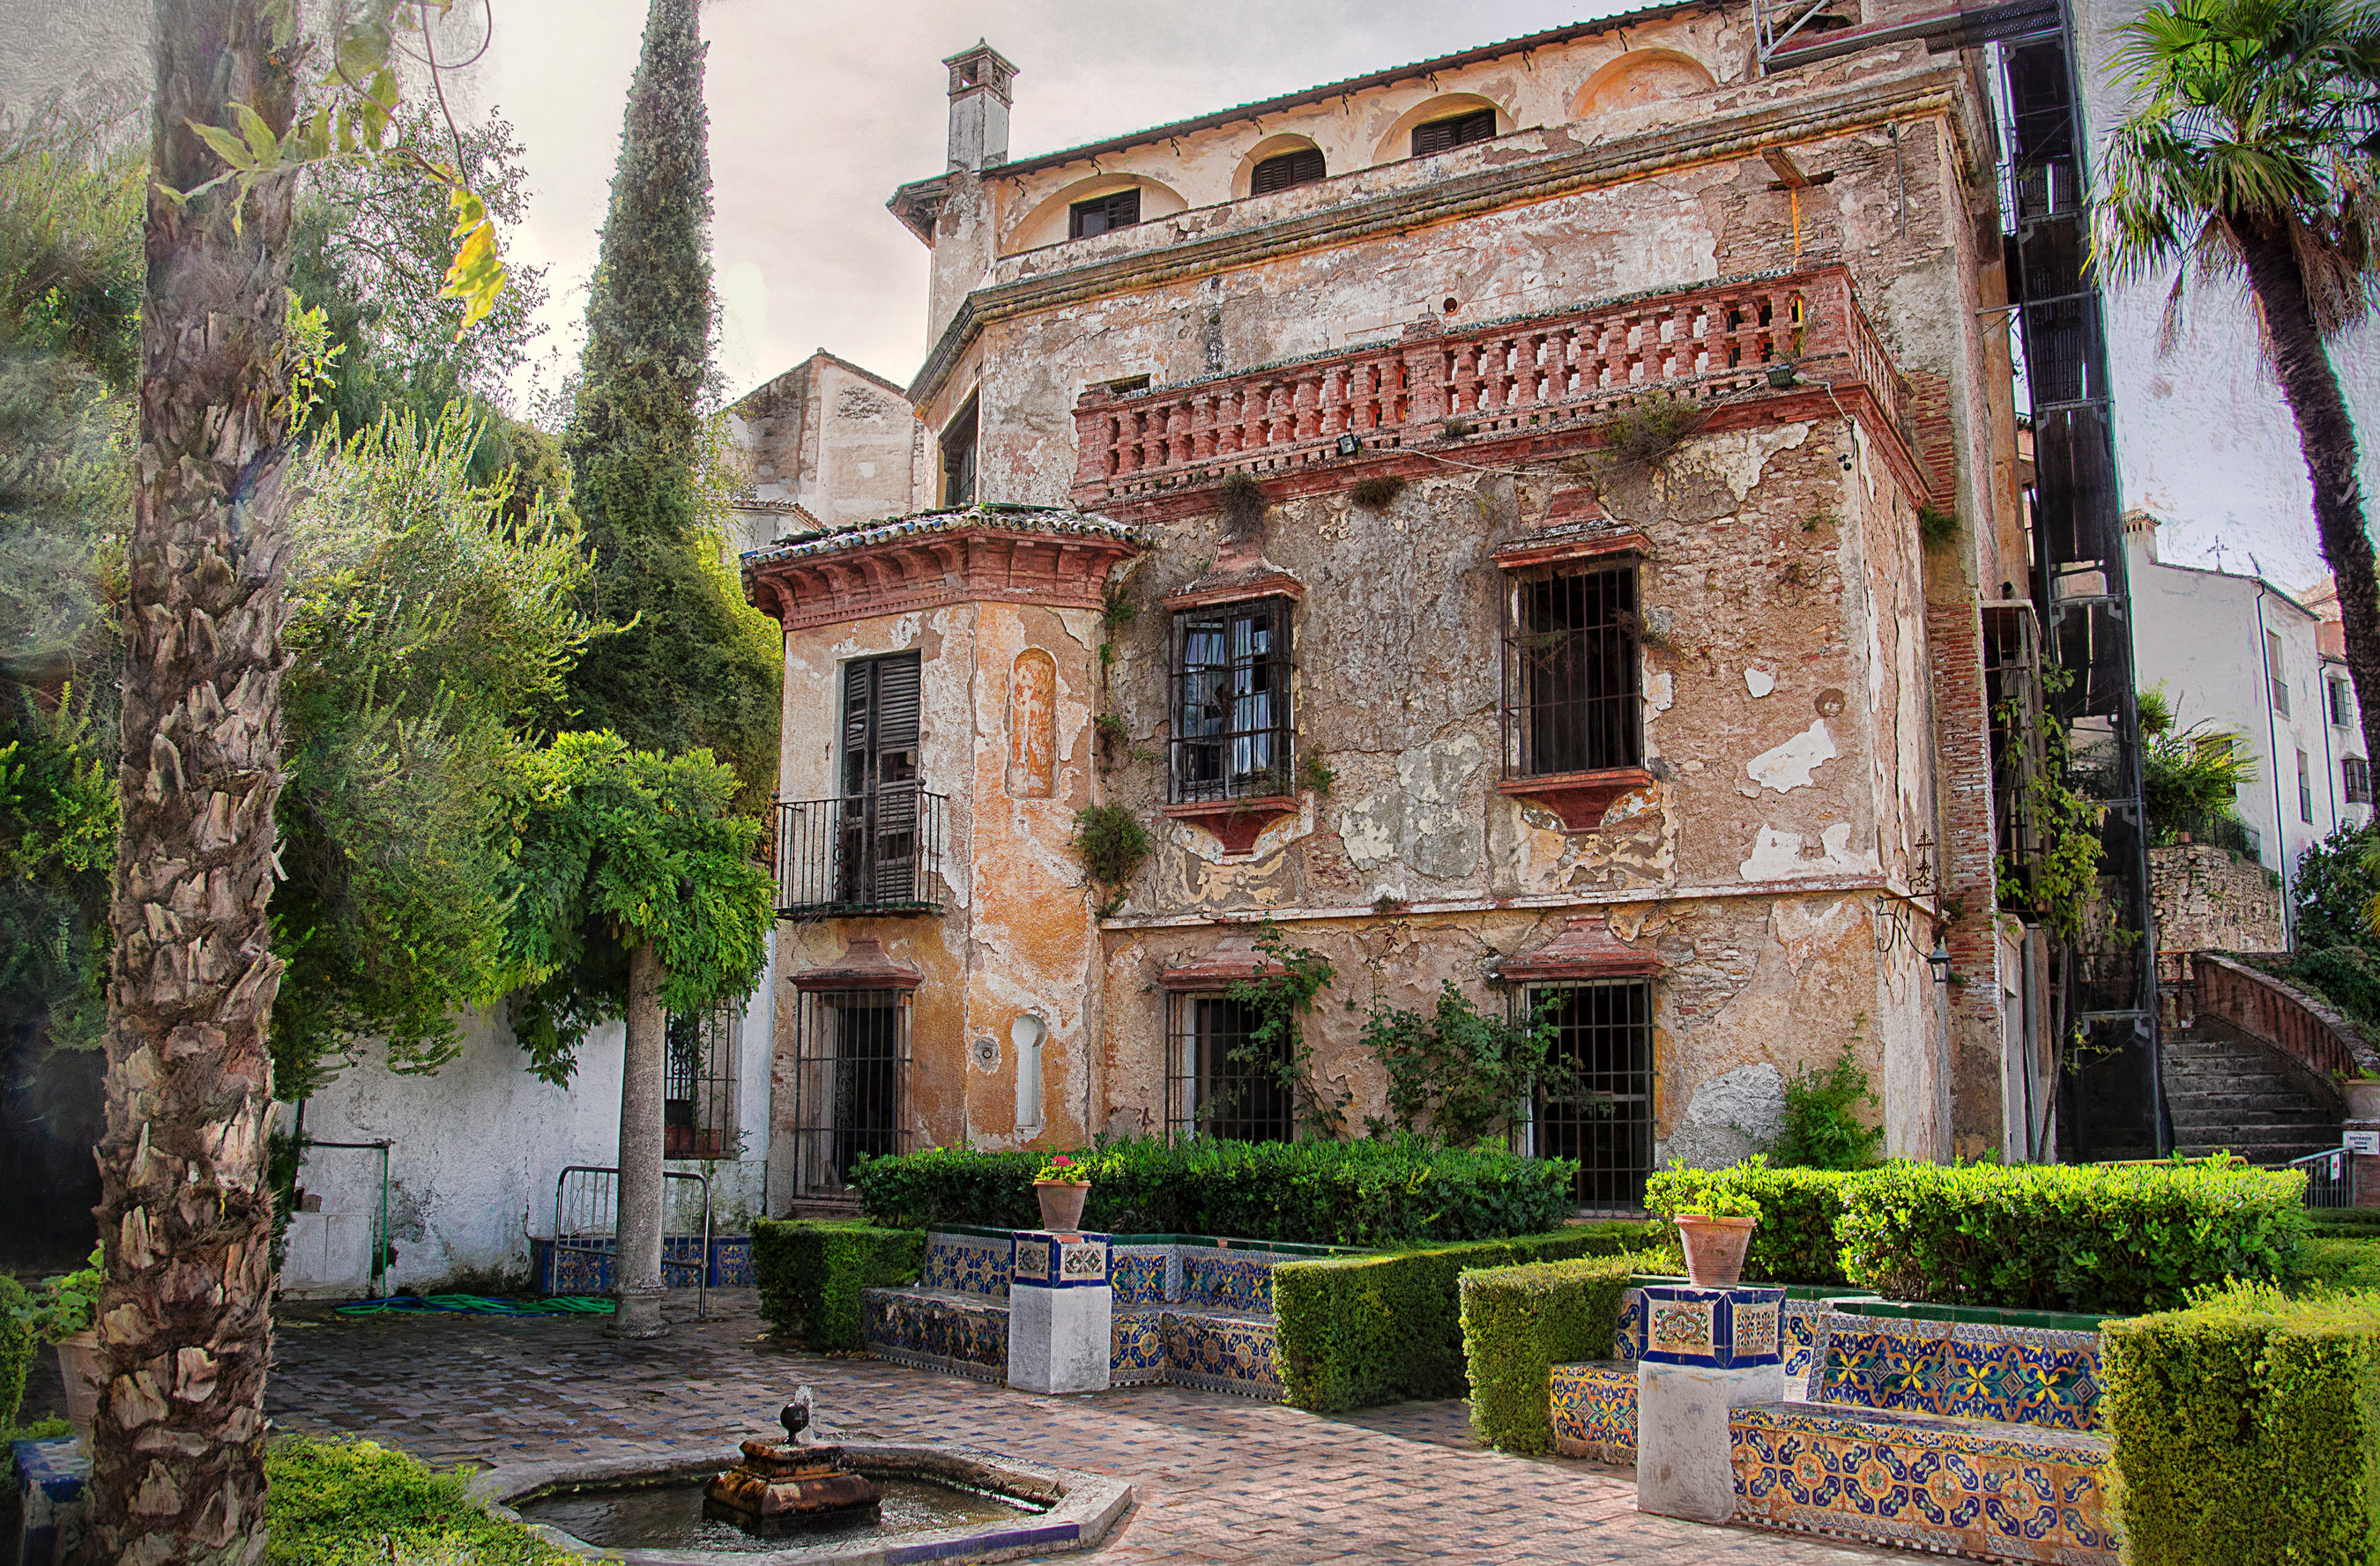 Spain - The Arab Baths in Ronda 003-133